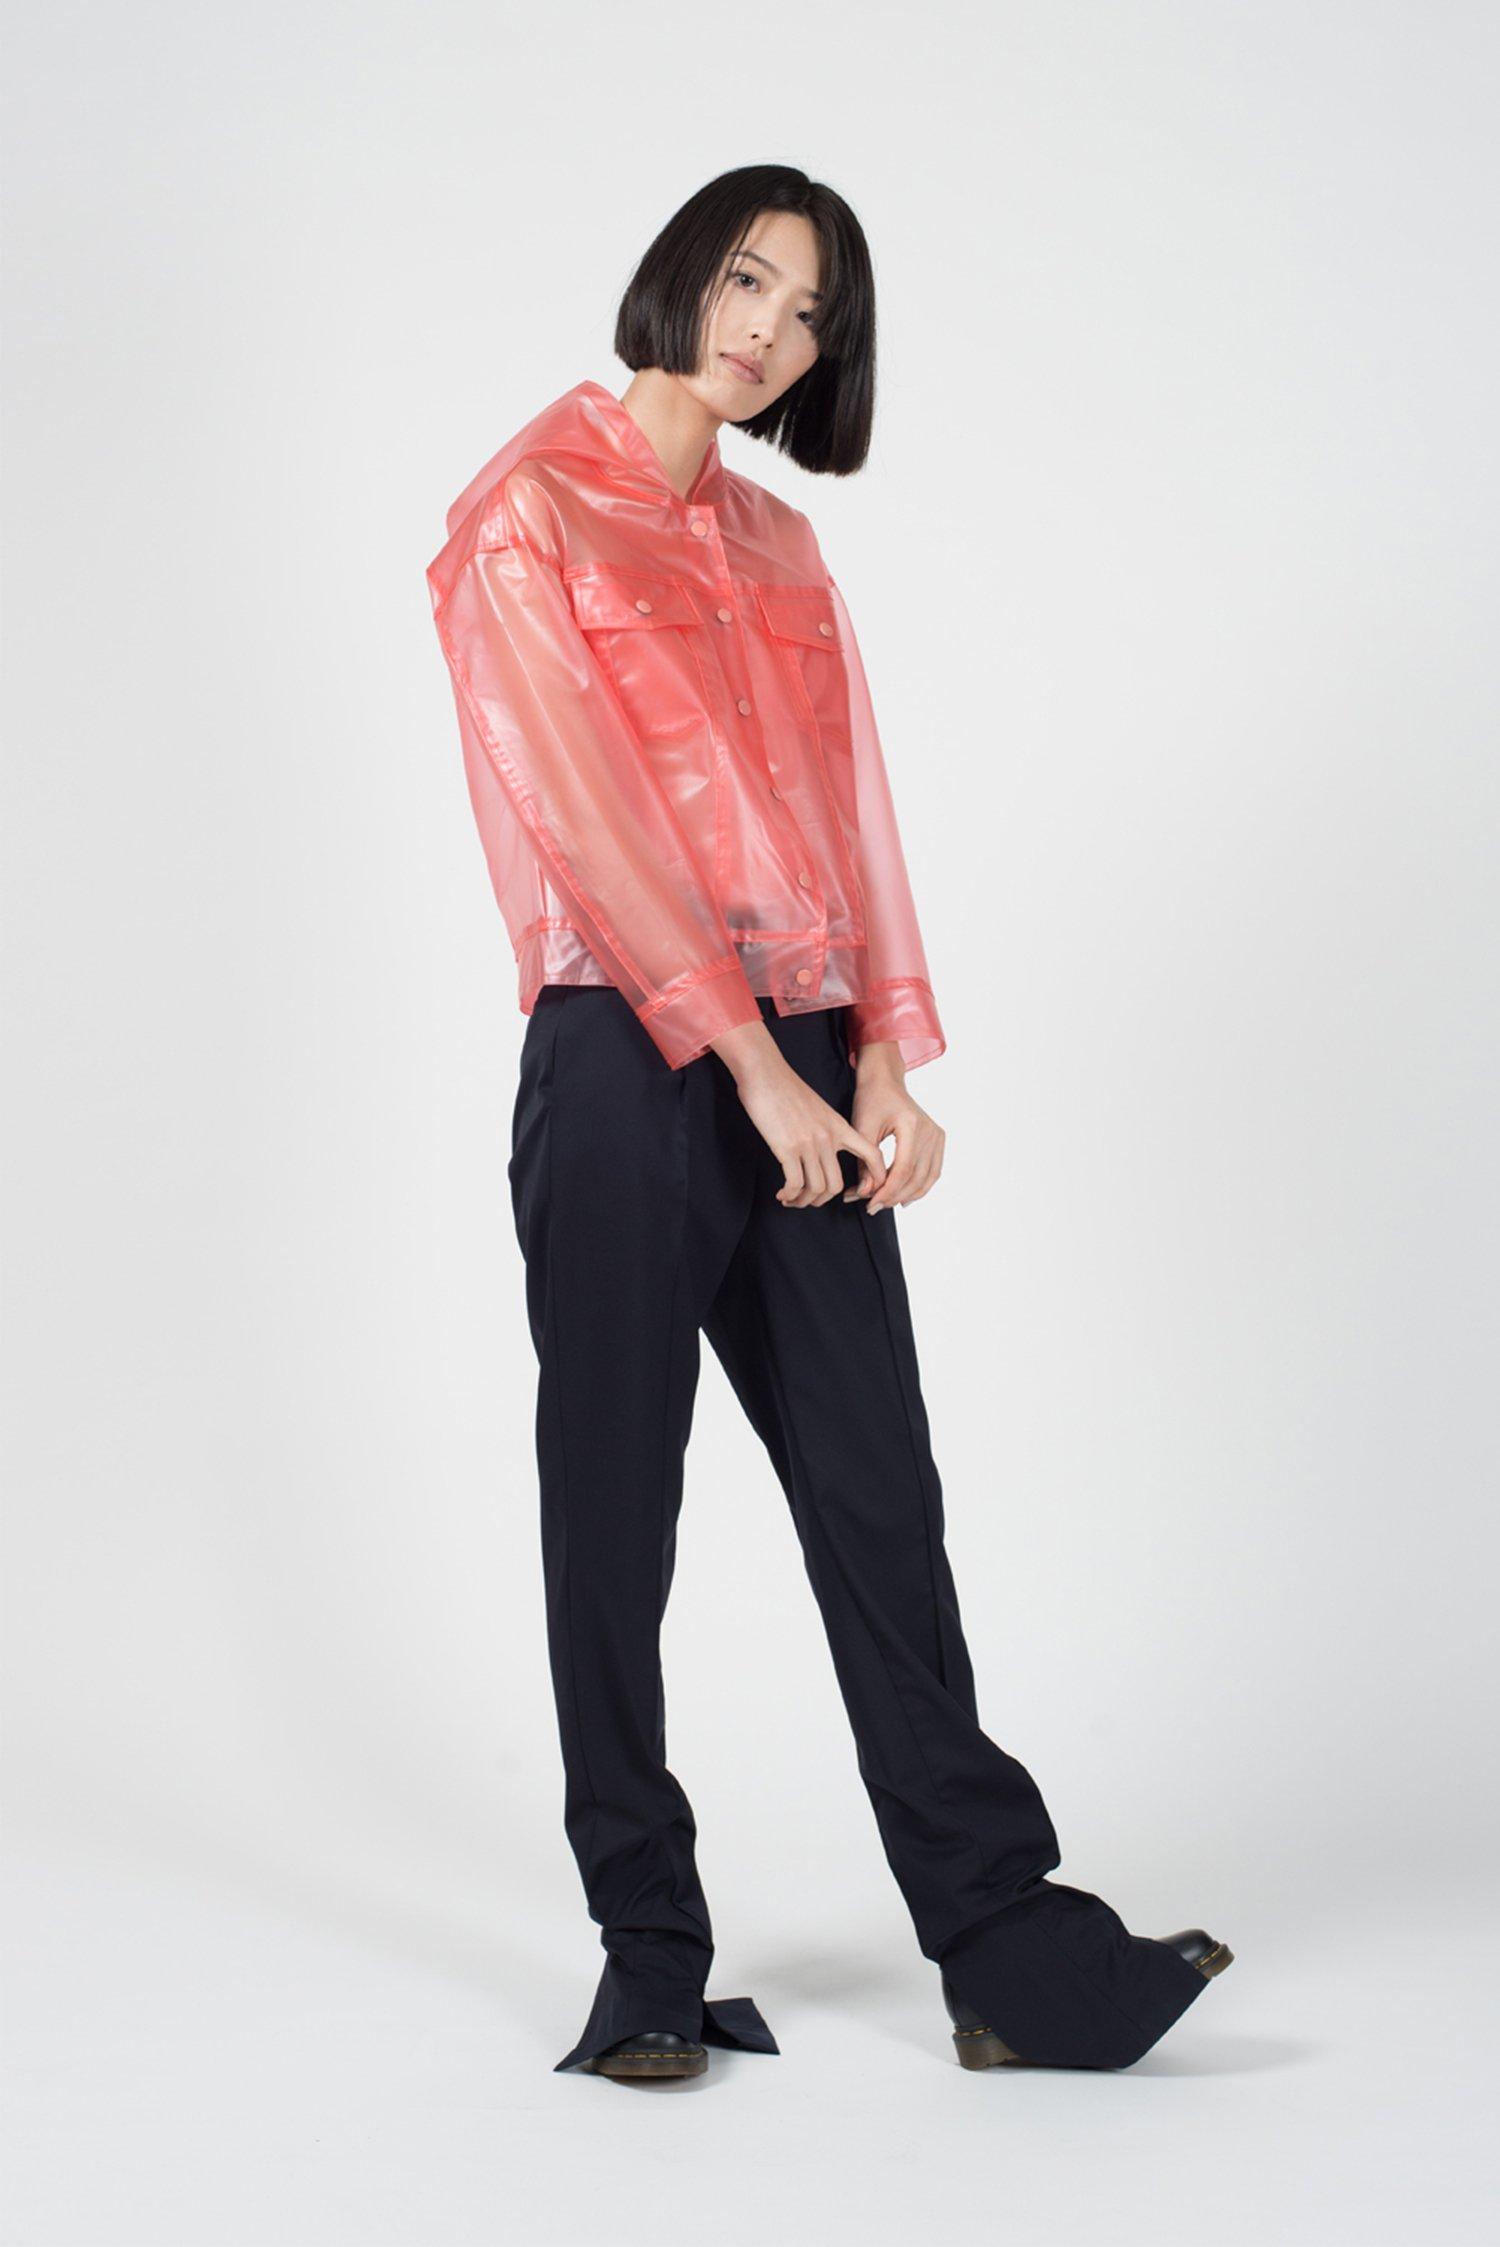 GINLEE Studio Fog Raincoat, $205.20